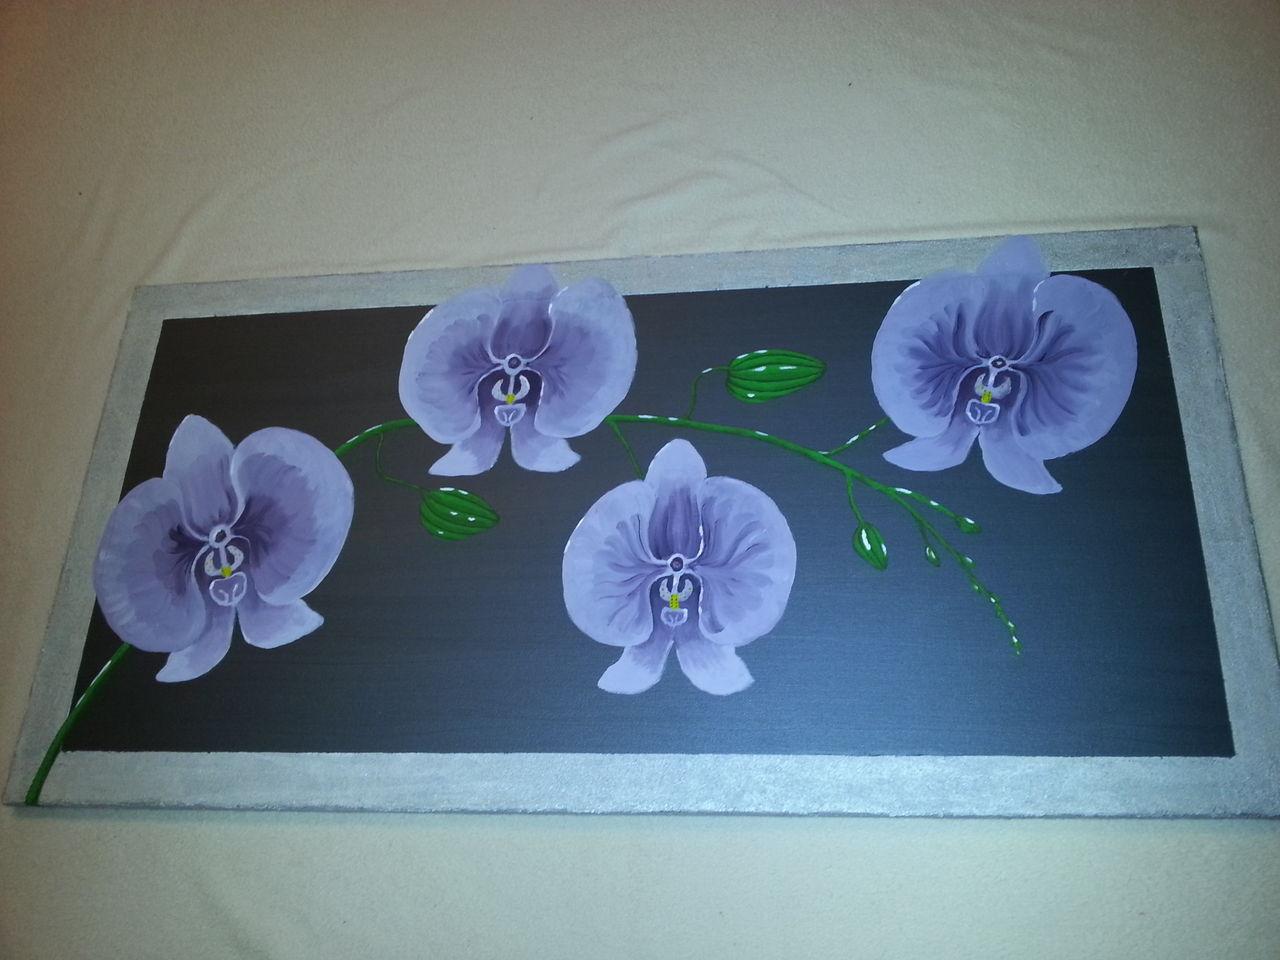 orchideen orchidee malen blumen acrylmalerei von lukas szewczyk bei kunstnet. Black Bedroom Furniture Sets. Home Design Ideas